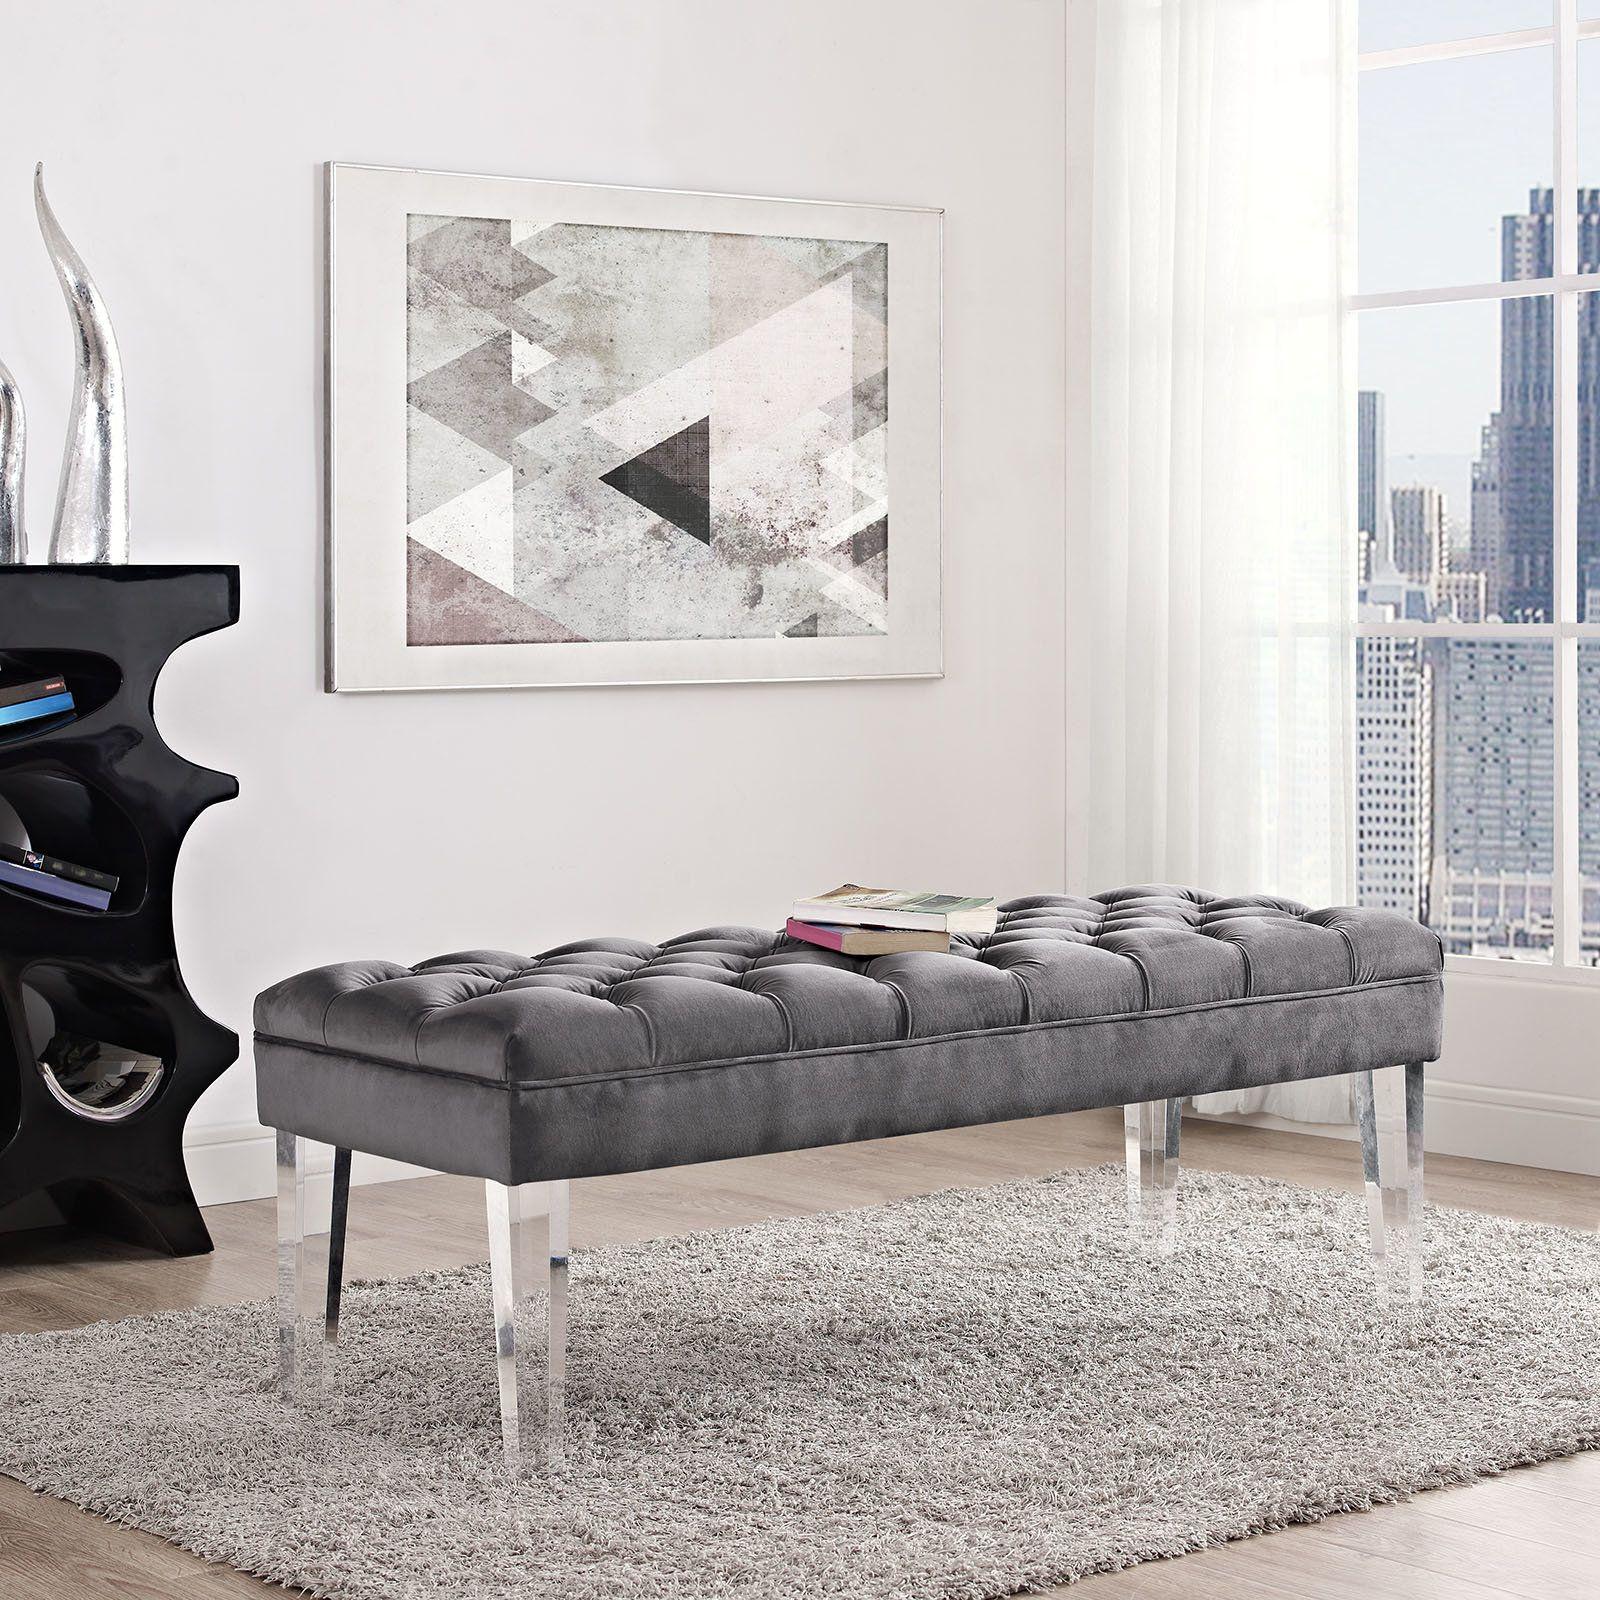 Fashionable Bedroom Refurbish March 2019 Upholstered Bench Upholstered Bench Bedroom Velvet Bench